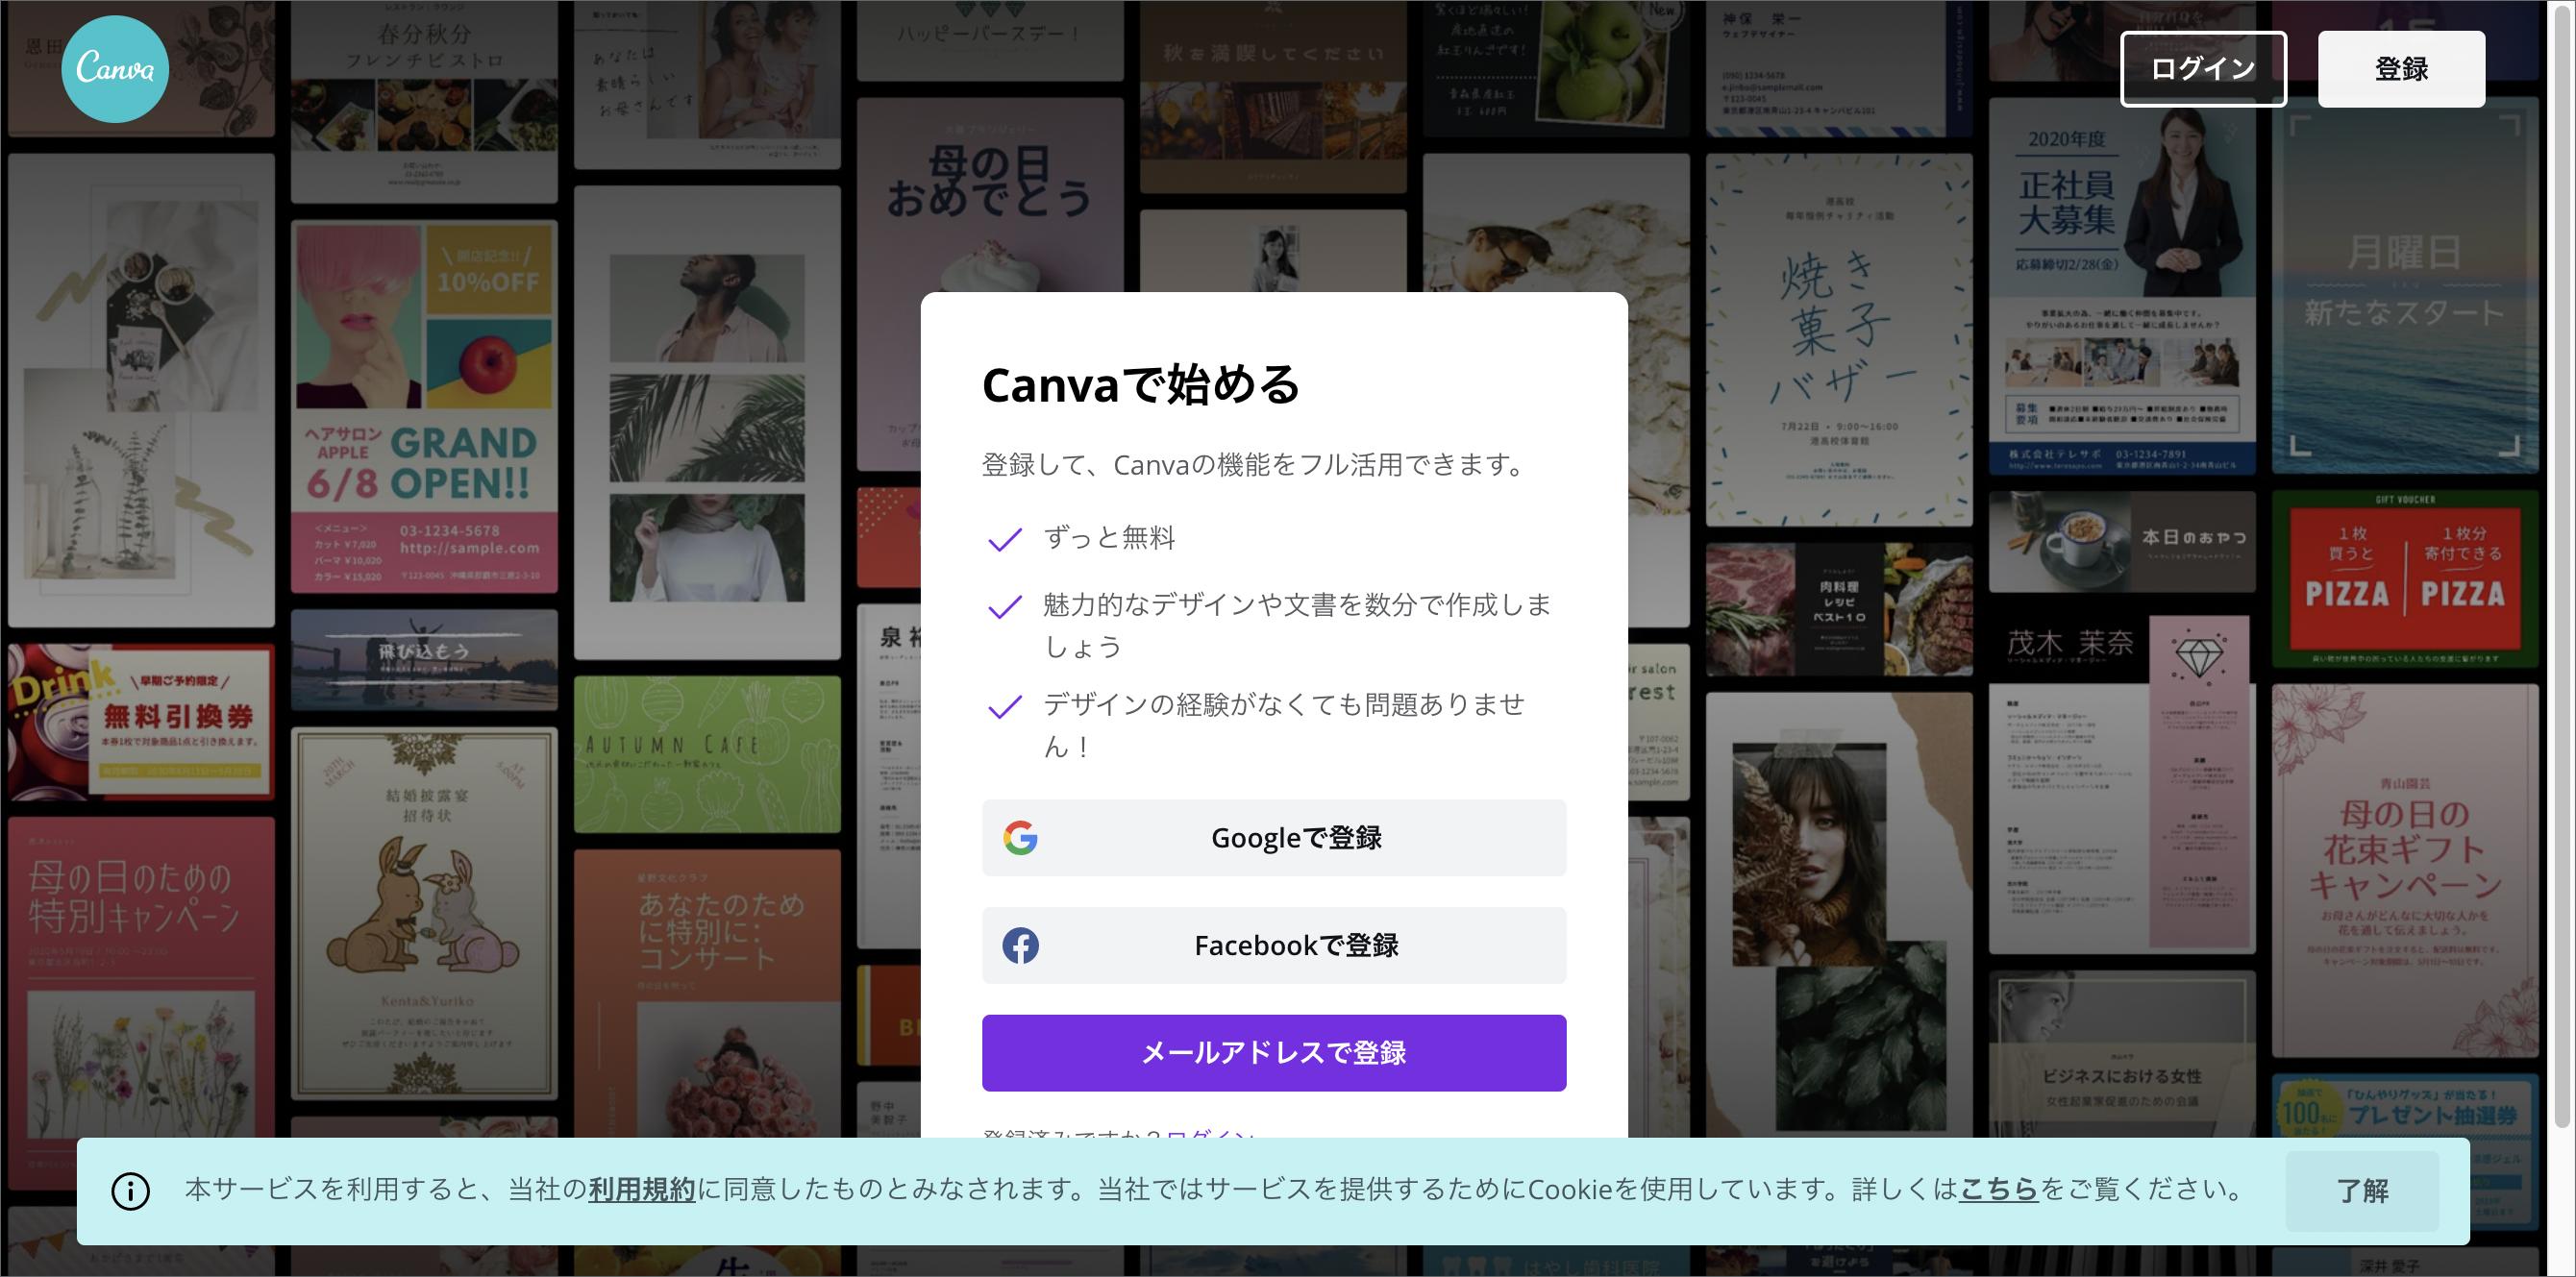 cms_update_20210330_how2_register